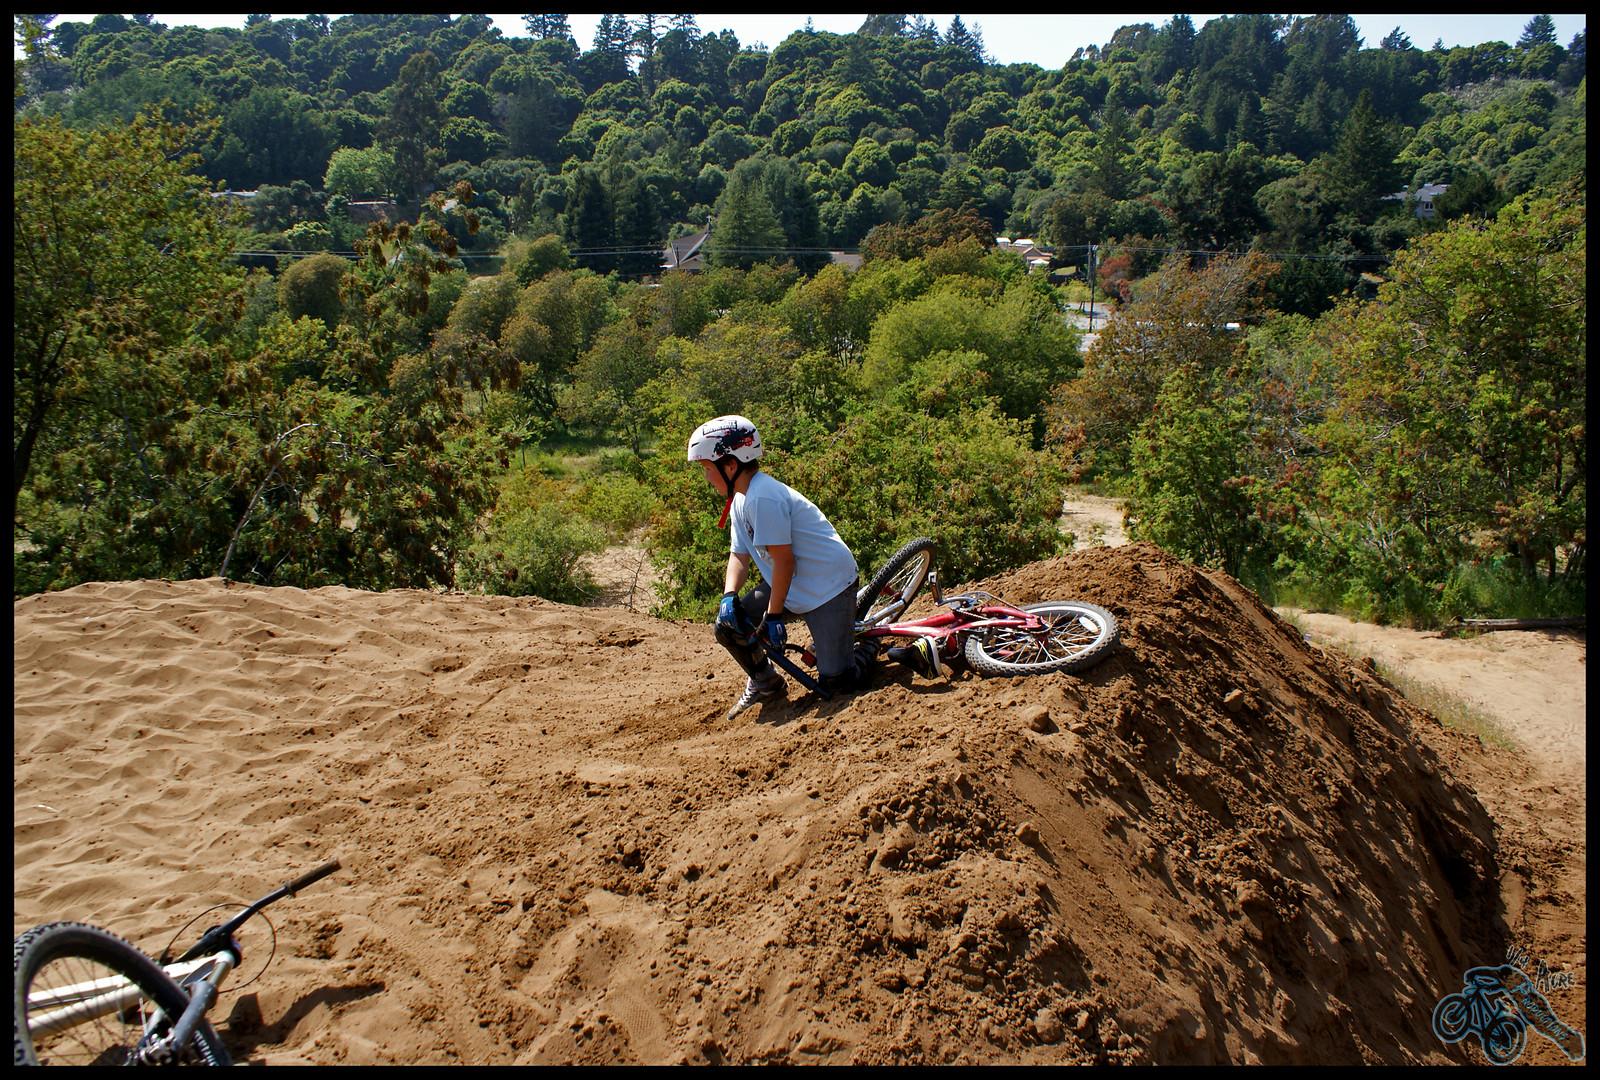 Caleb - Aptos-Rider - Mountain Biking Pictures - Vital MTB